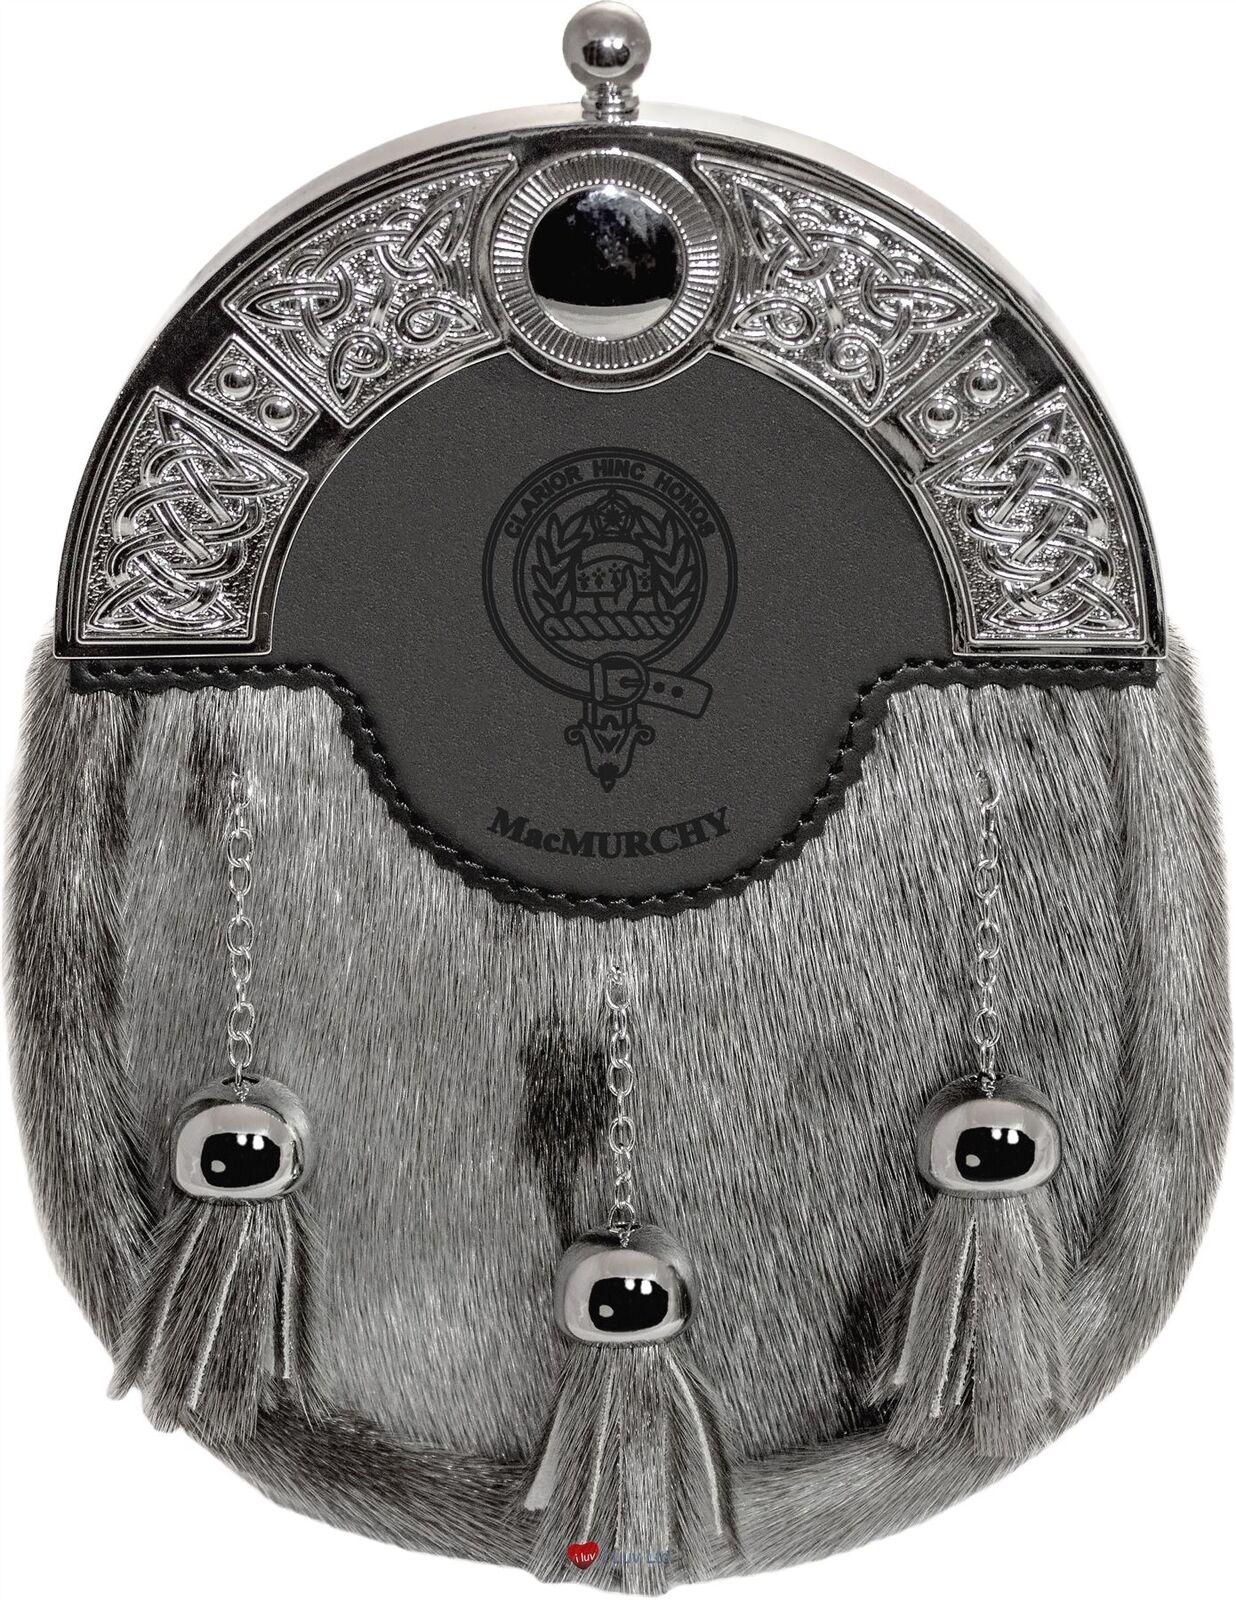 MacMurchy Dress Sporran 3 Tassels Studded Celtic Arch Scottish Clan Crest